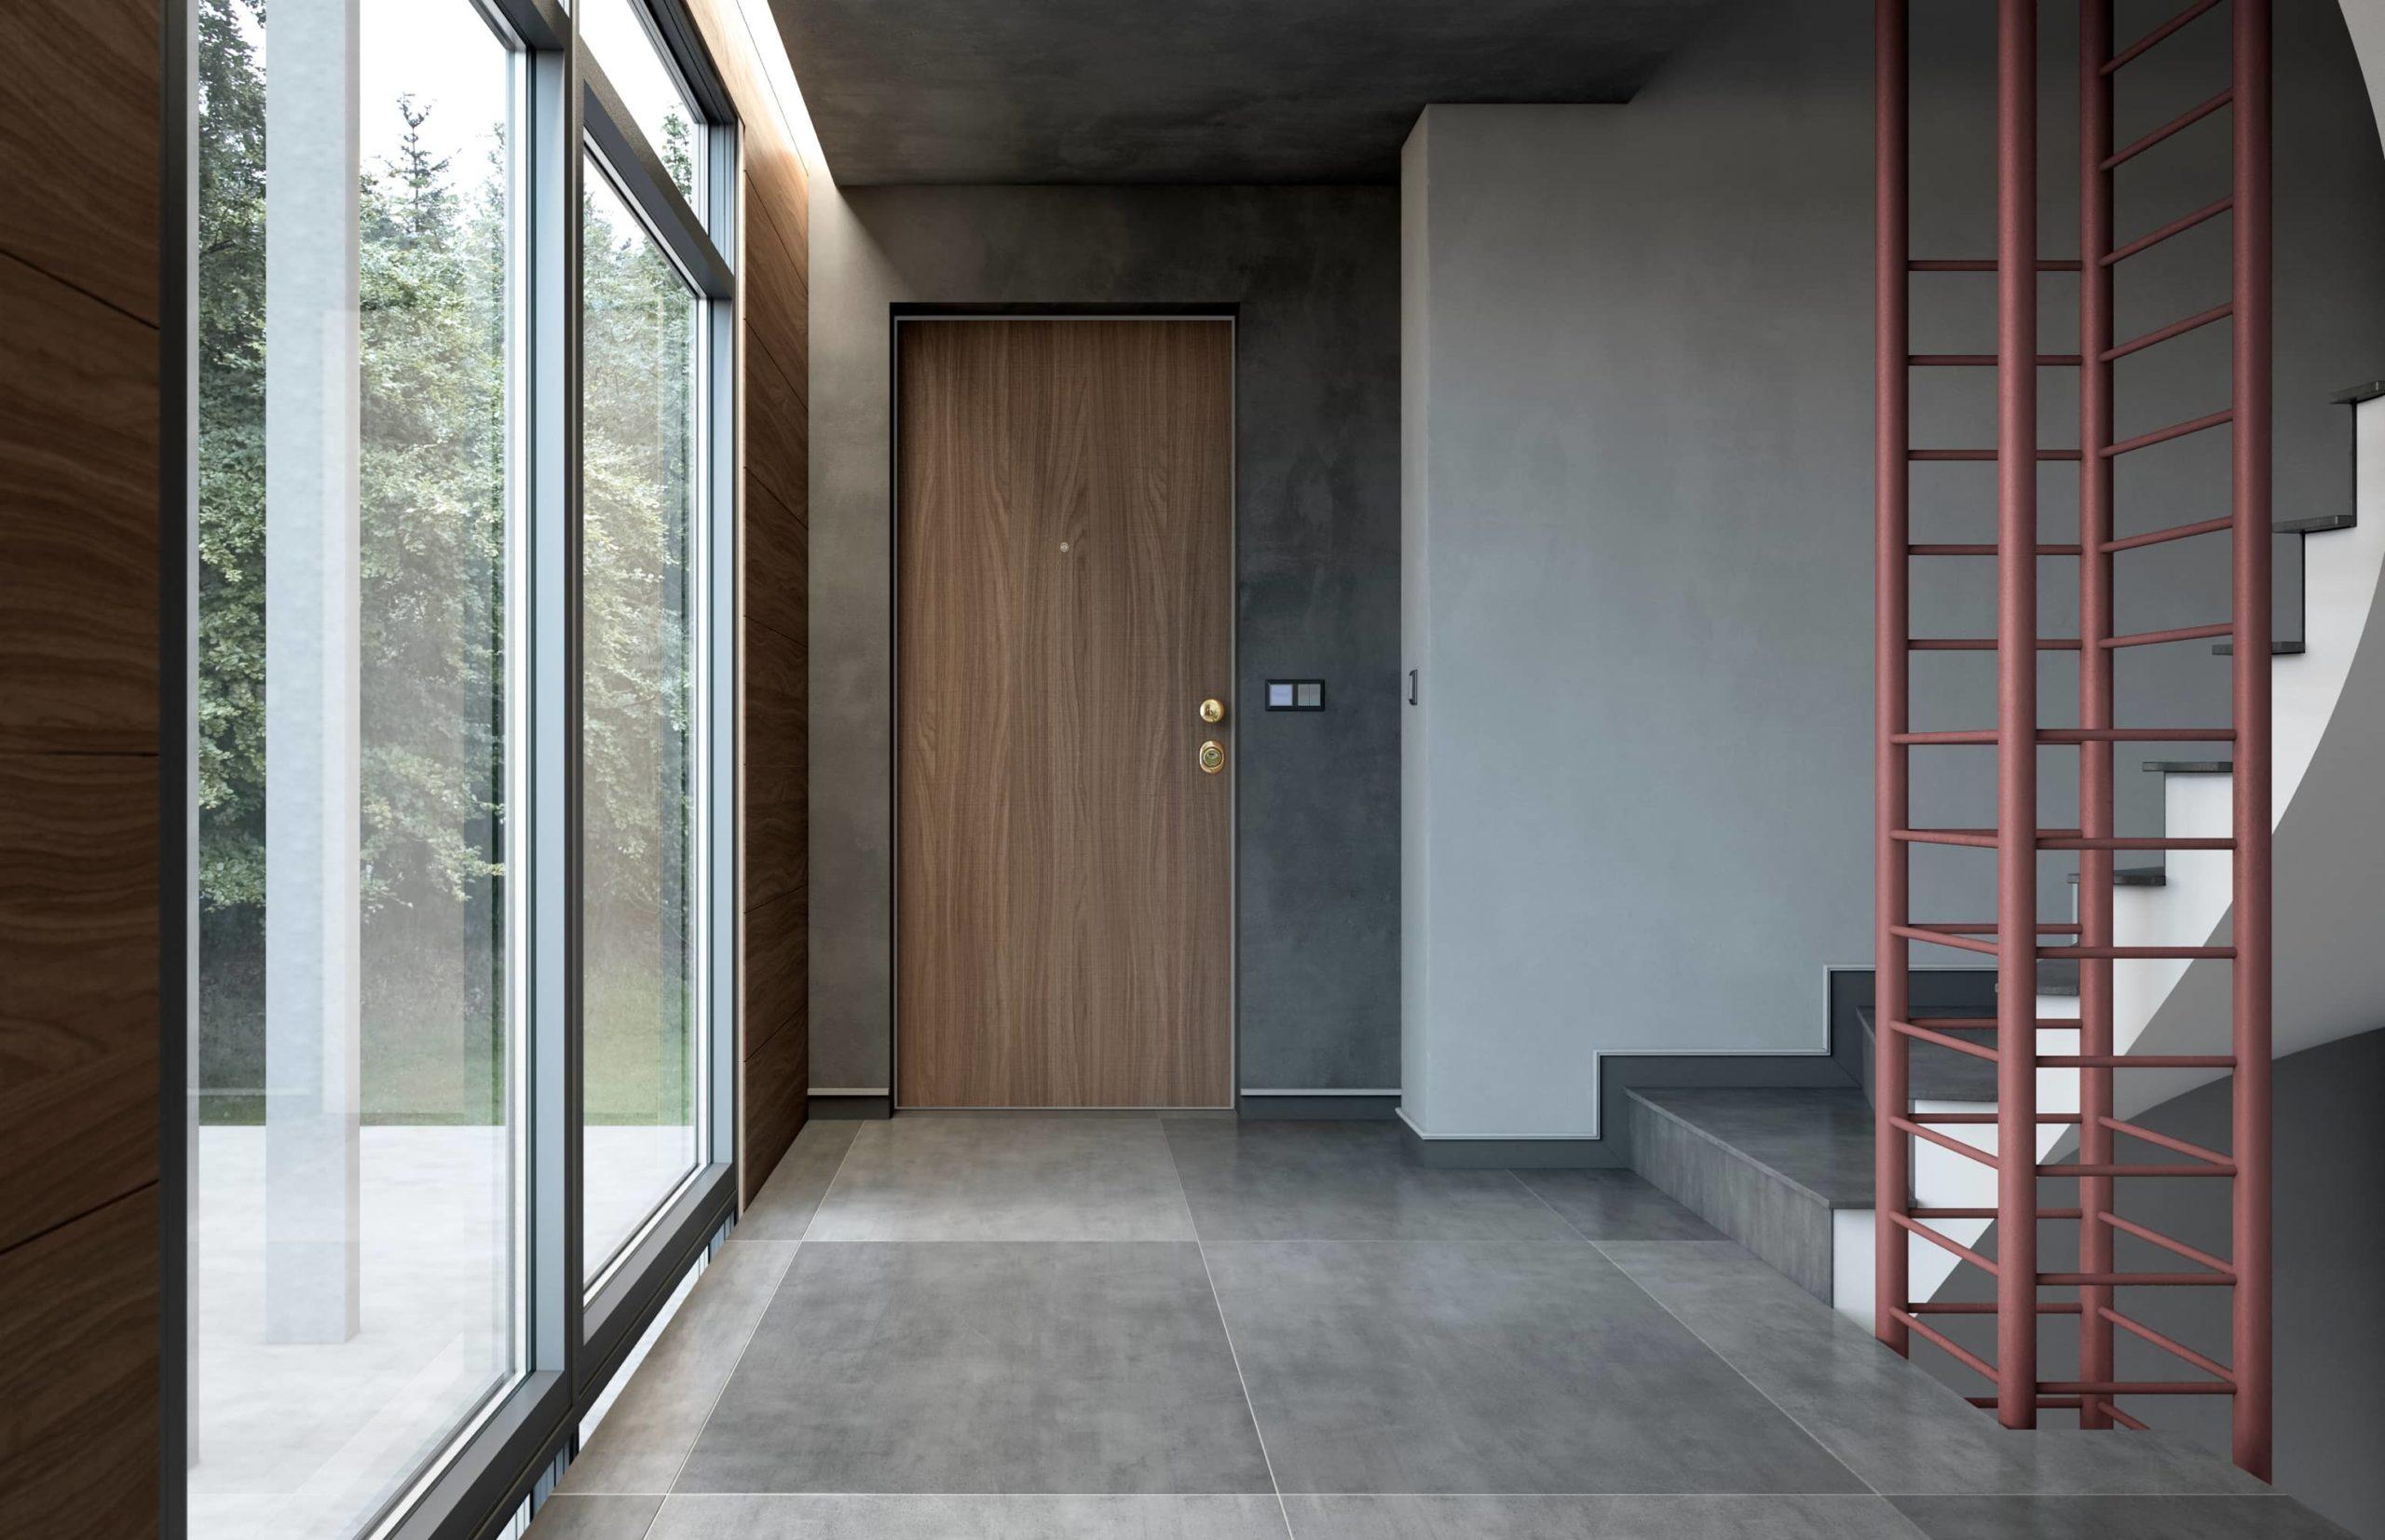 Oikos puerta Project escalera